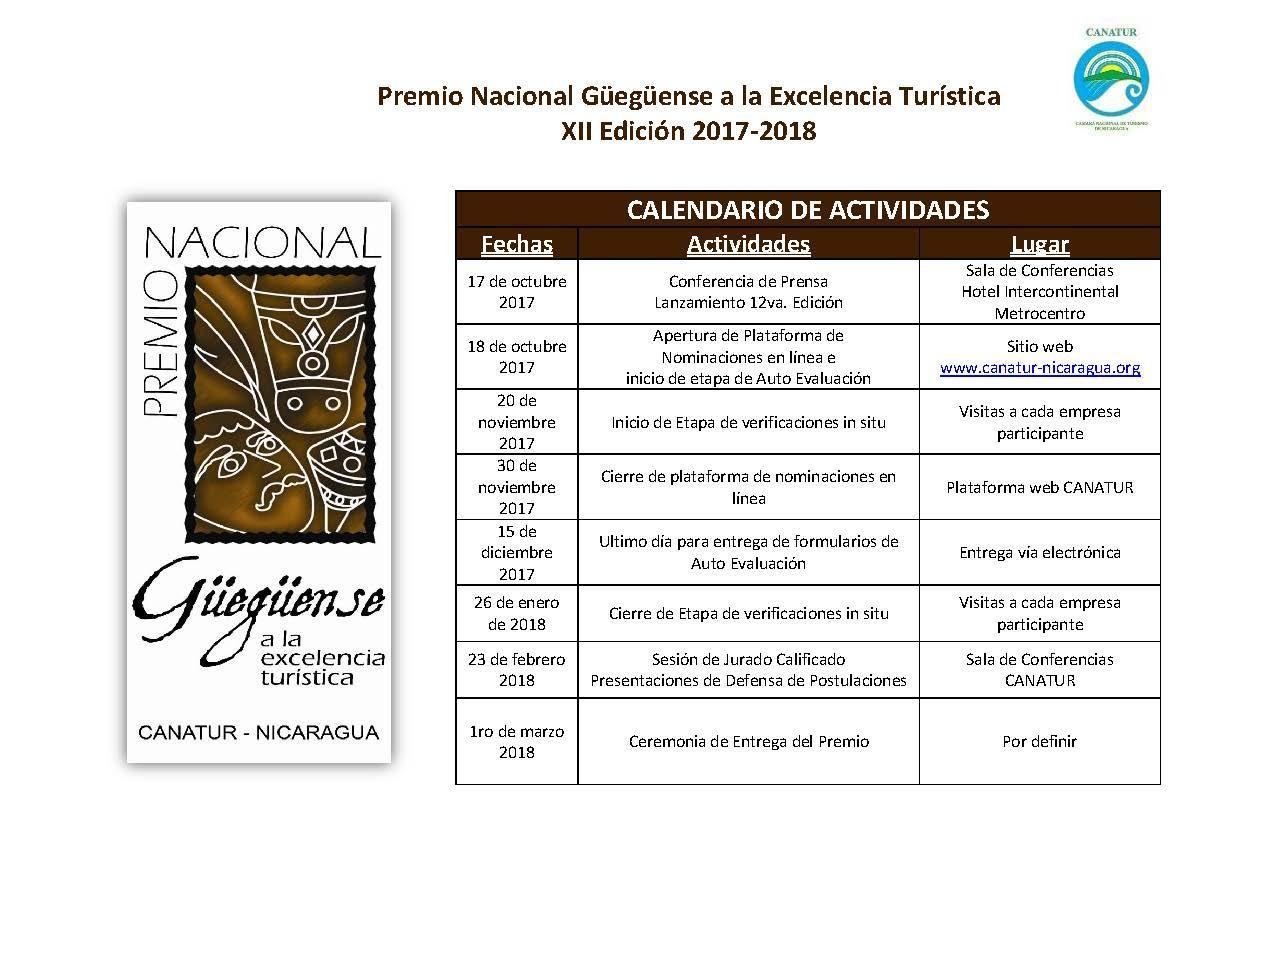 Calendario Actividades_12va Edicion PNGET